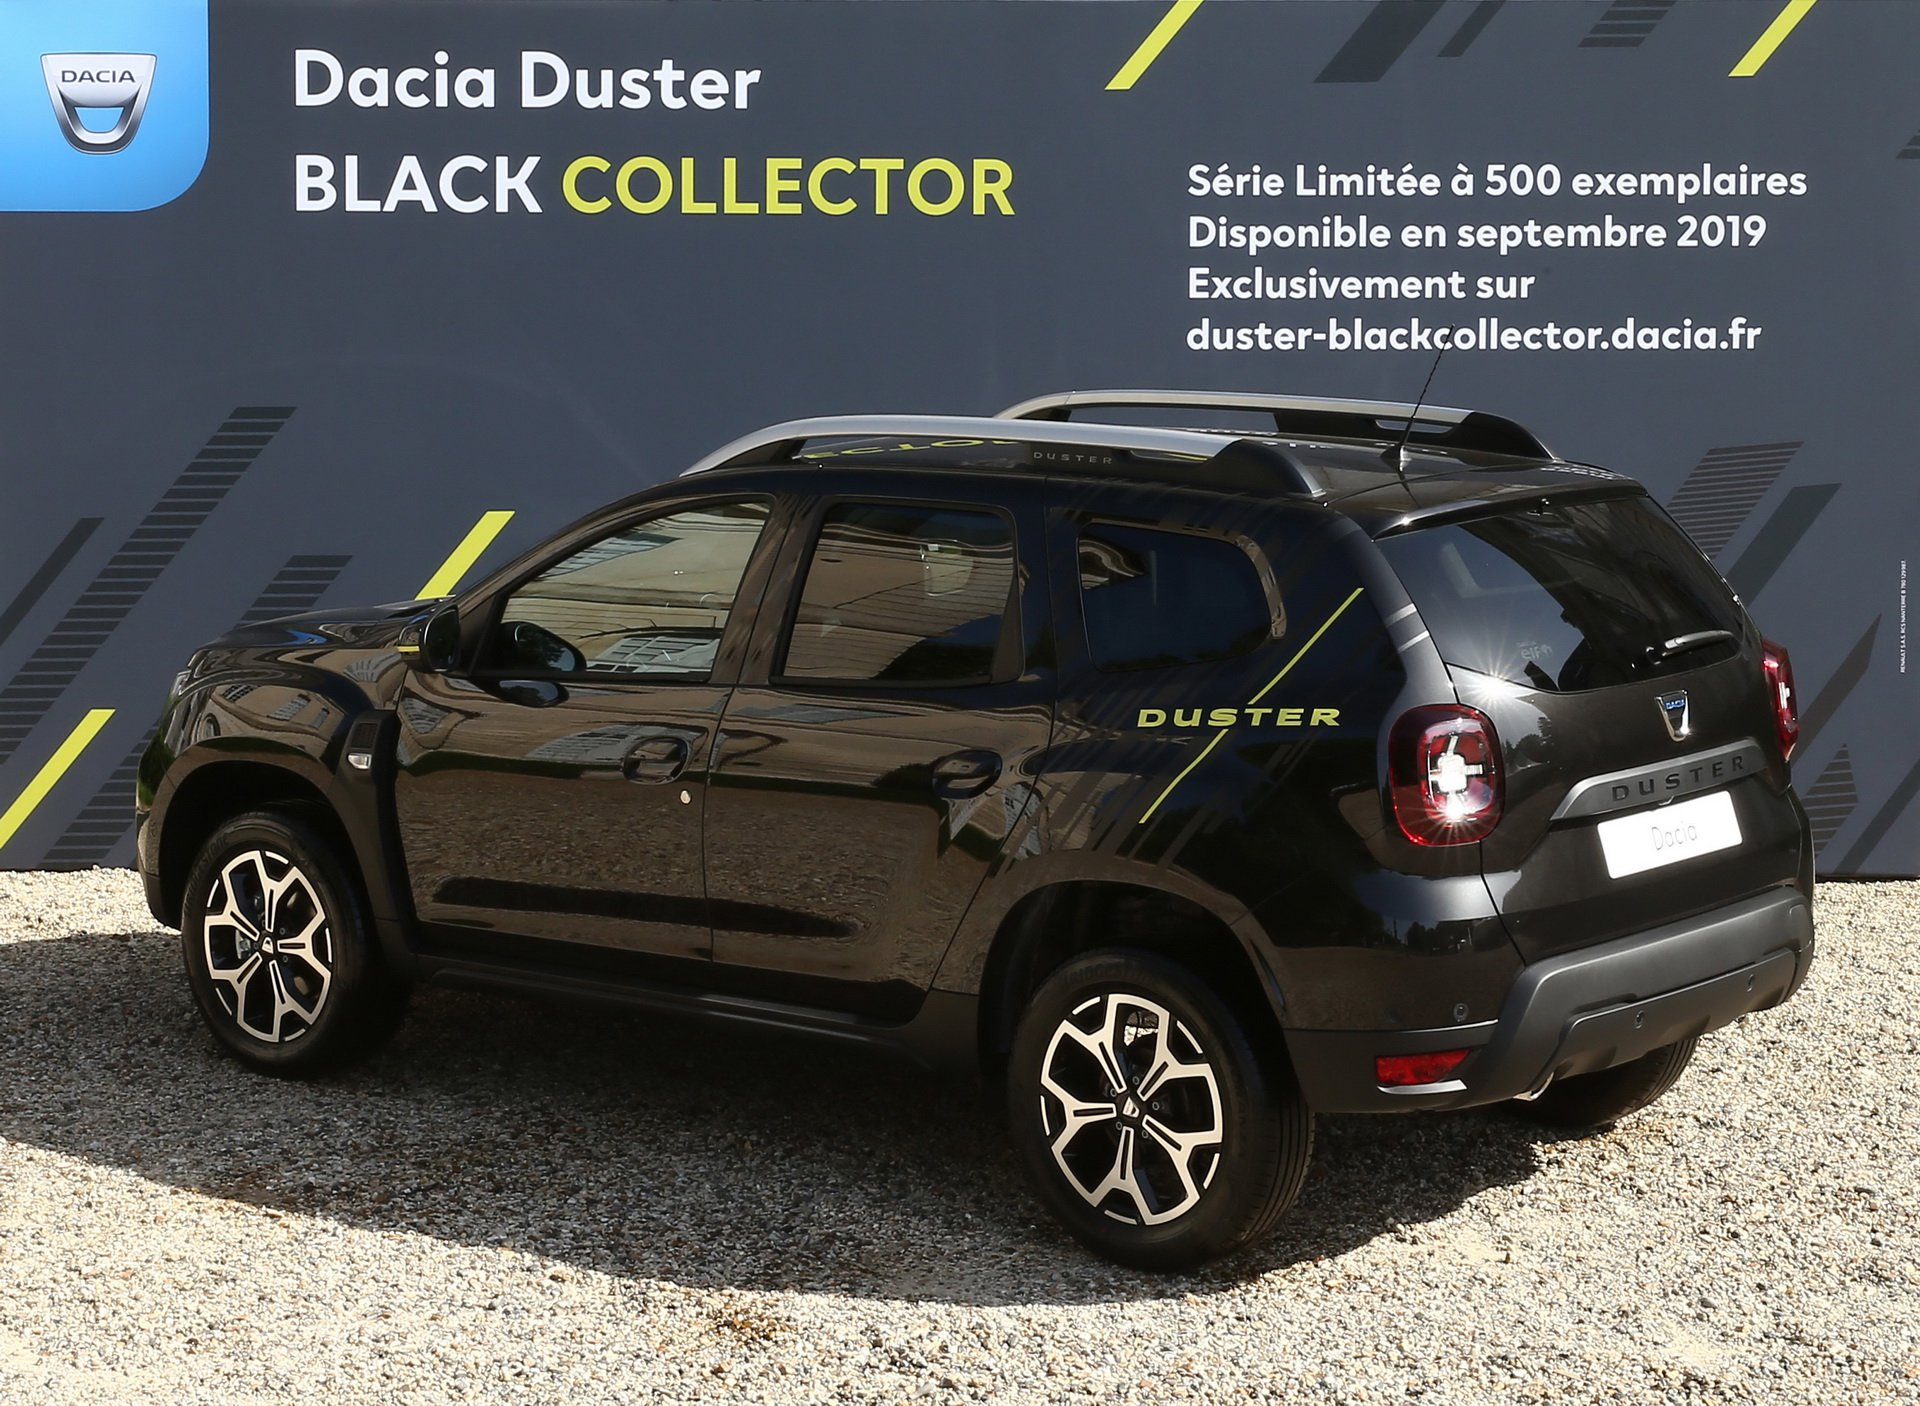 Dacia_Duster_Black_Collector_Edition_0000